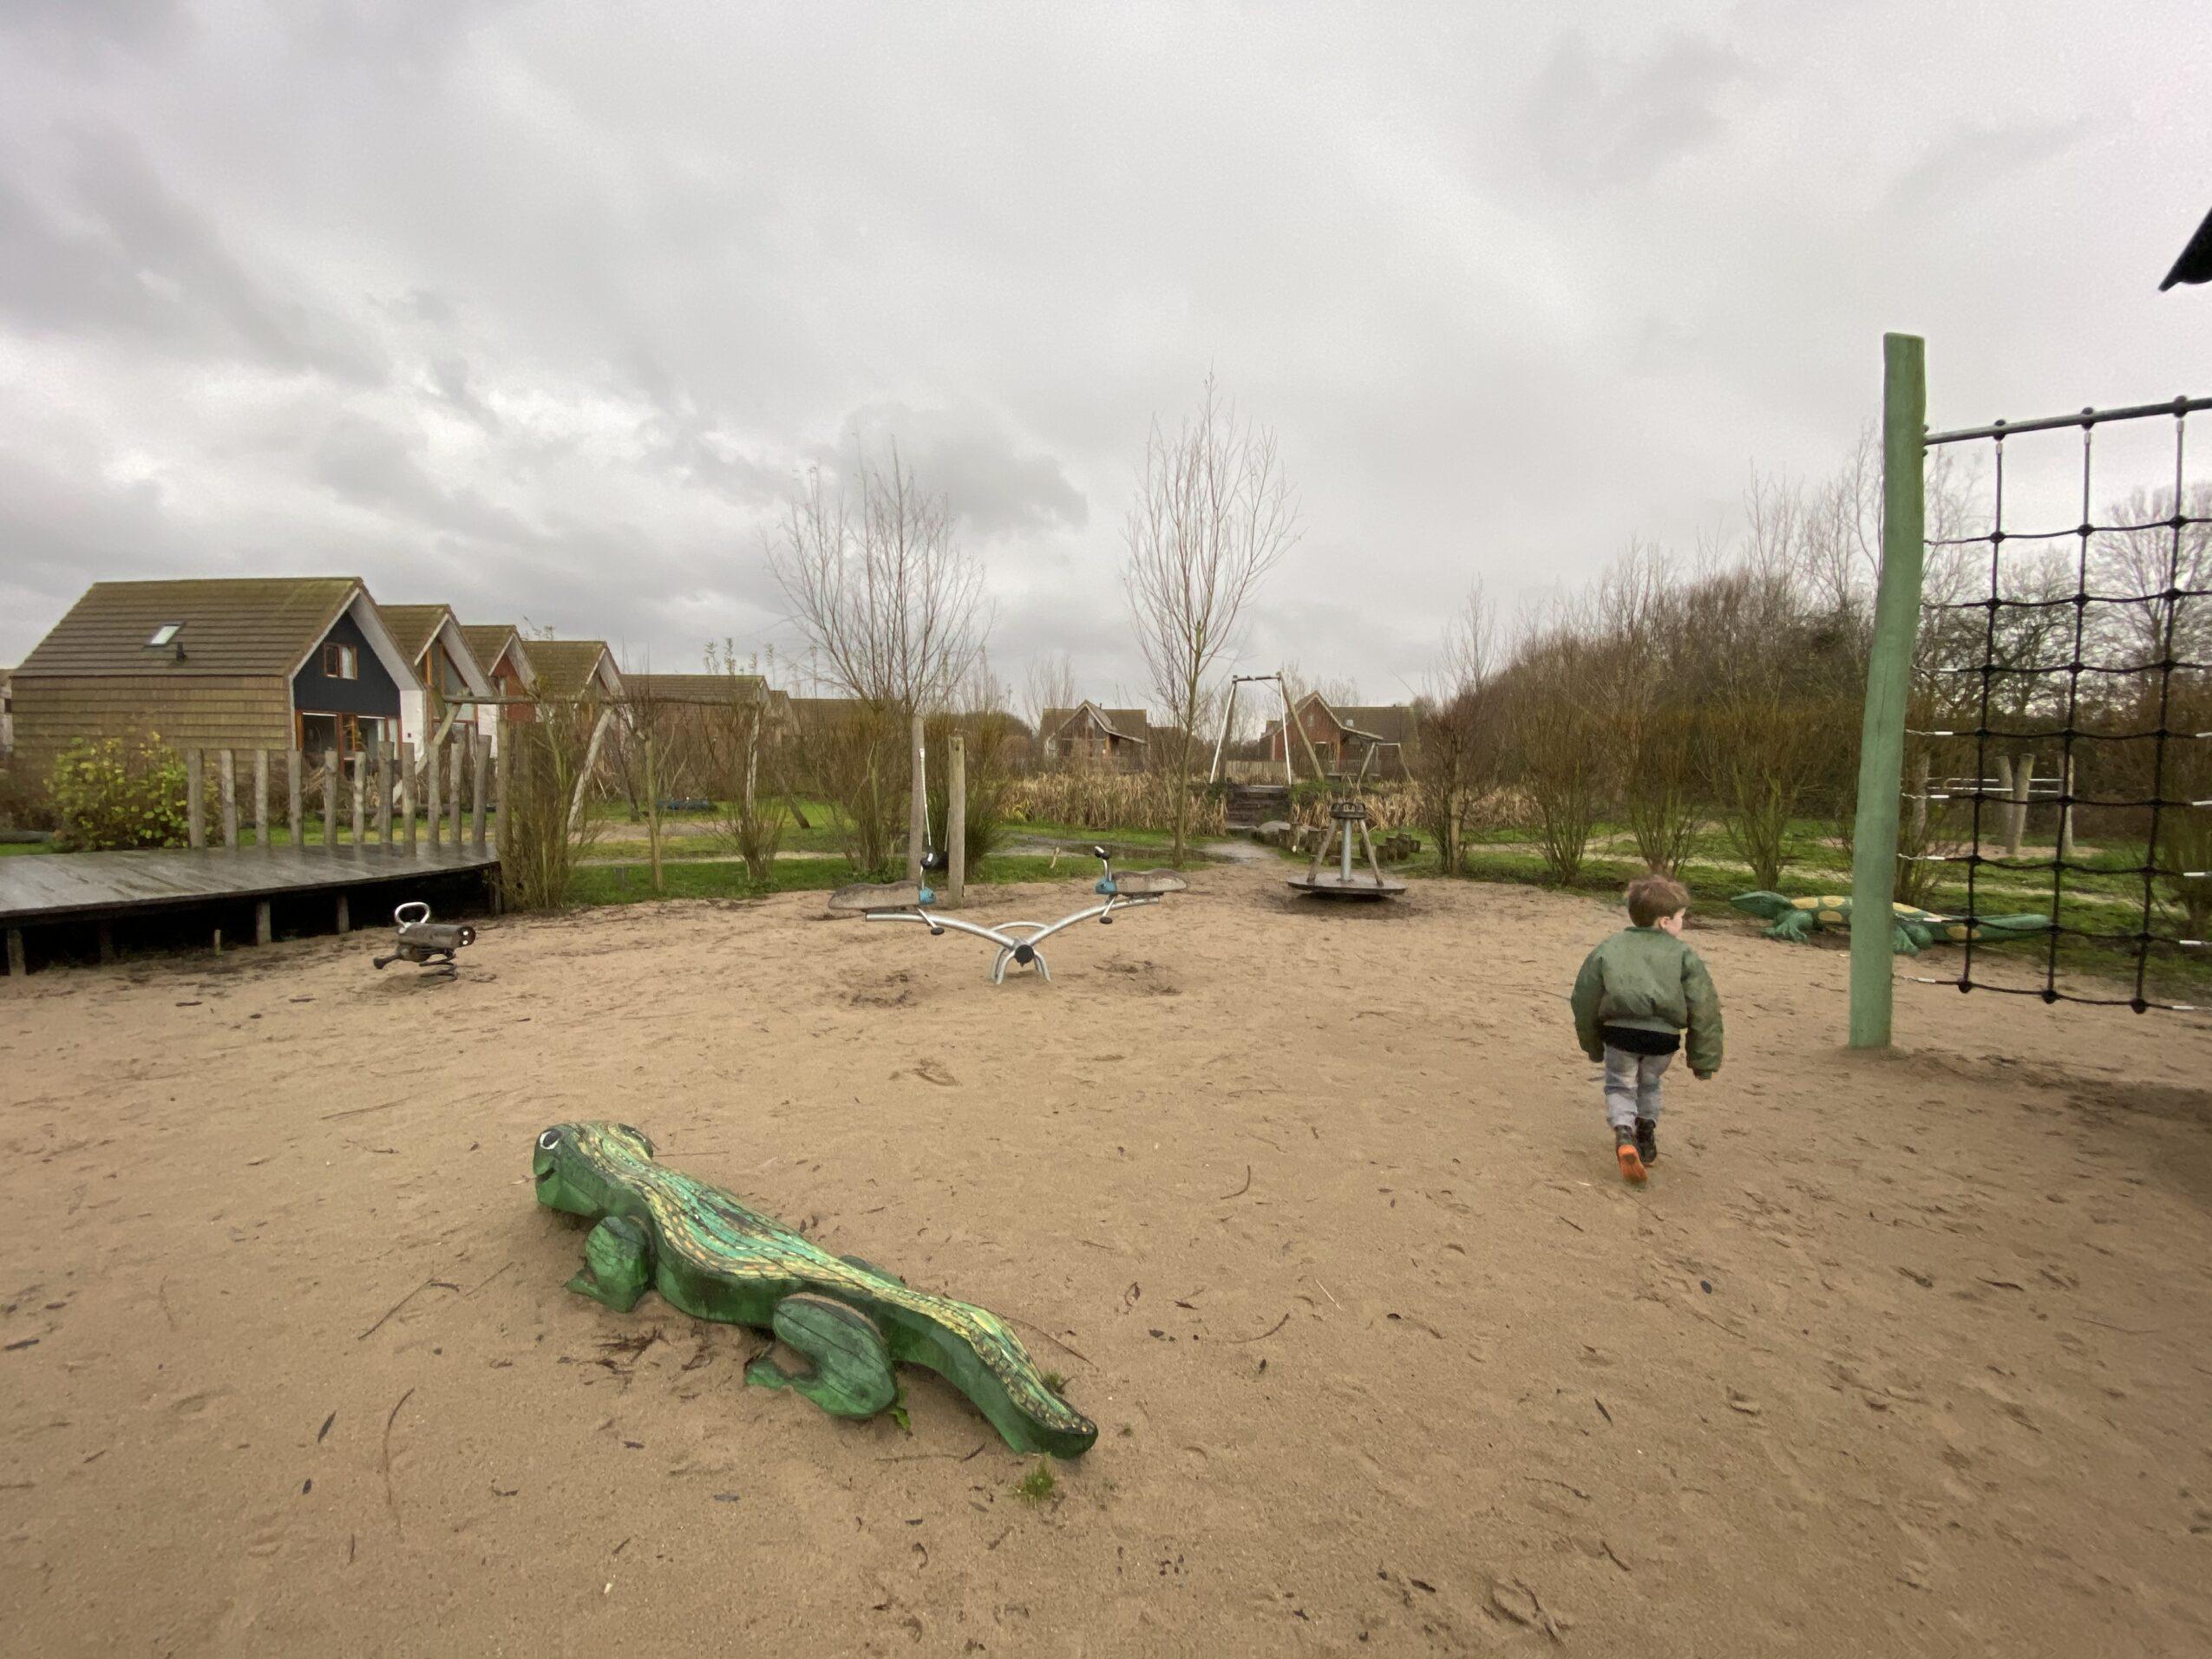 Natuurspeeltuin Landal De Reeuwijkse Plassen